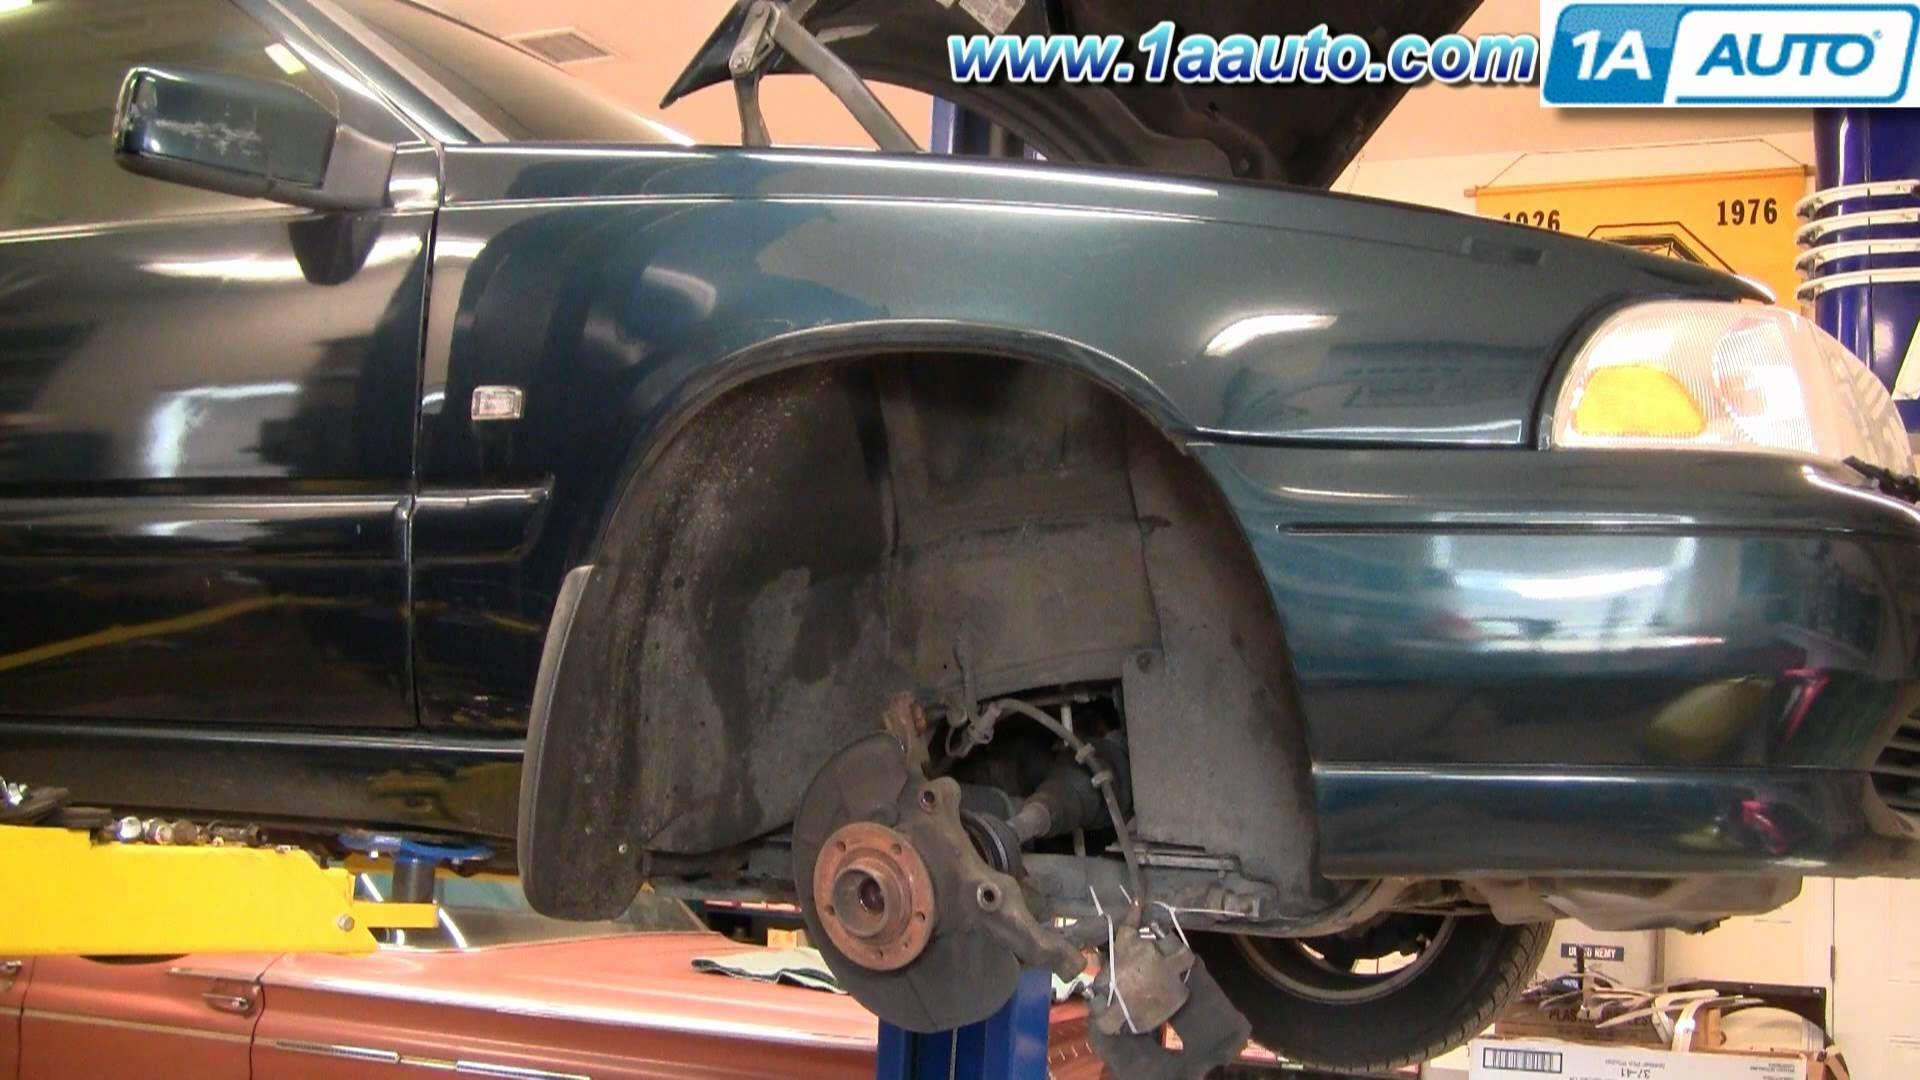 Replacing A Broken CV Axle On Your Car Auto repair, Car